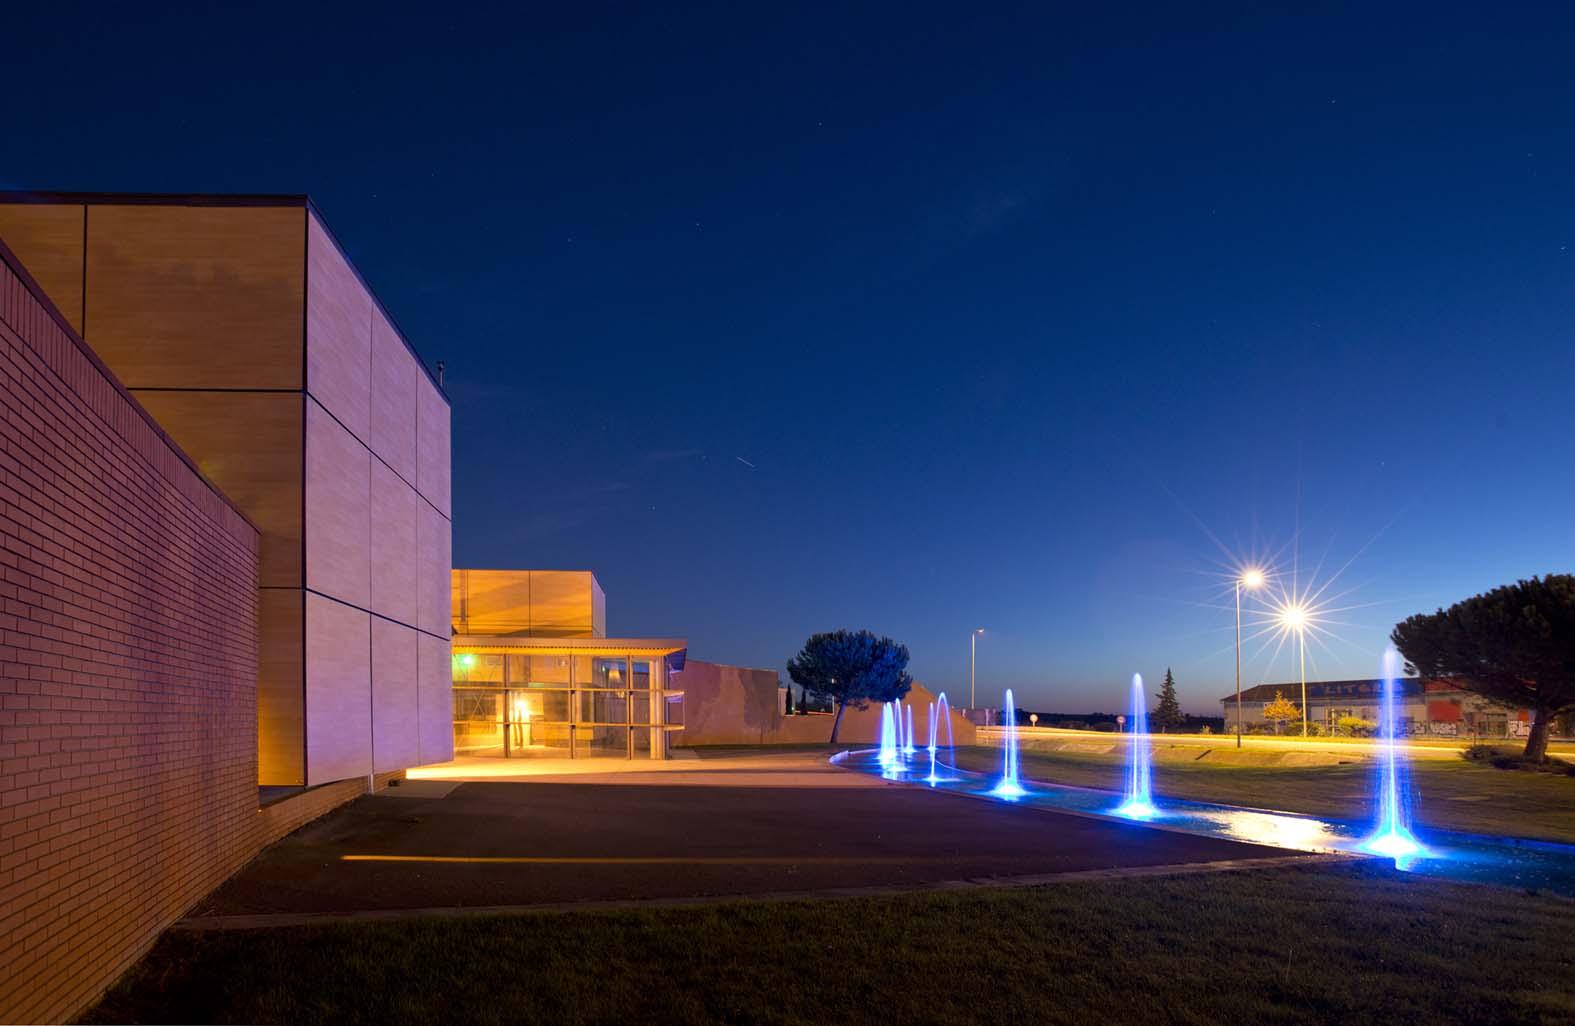 Pollestres-Entree-Ville-architecture-agena-ivan-morin-Perpignan-photographe